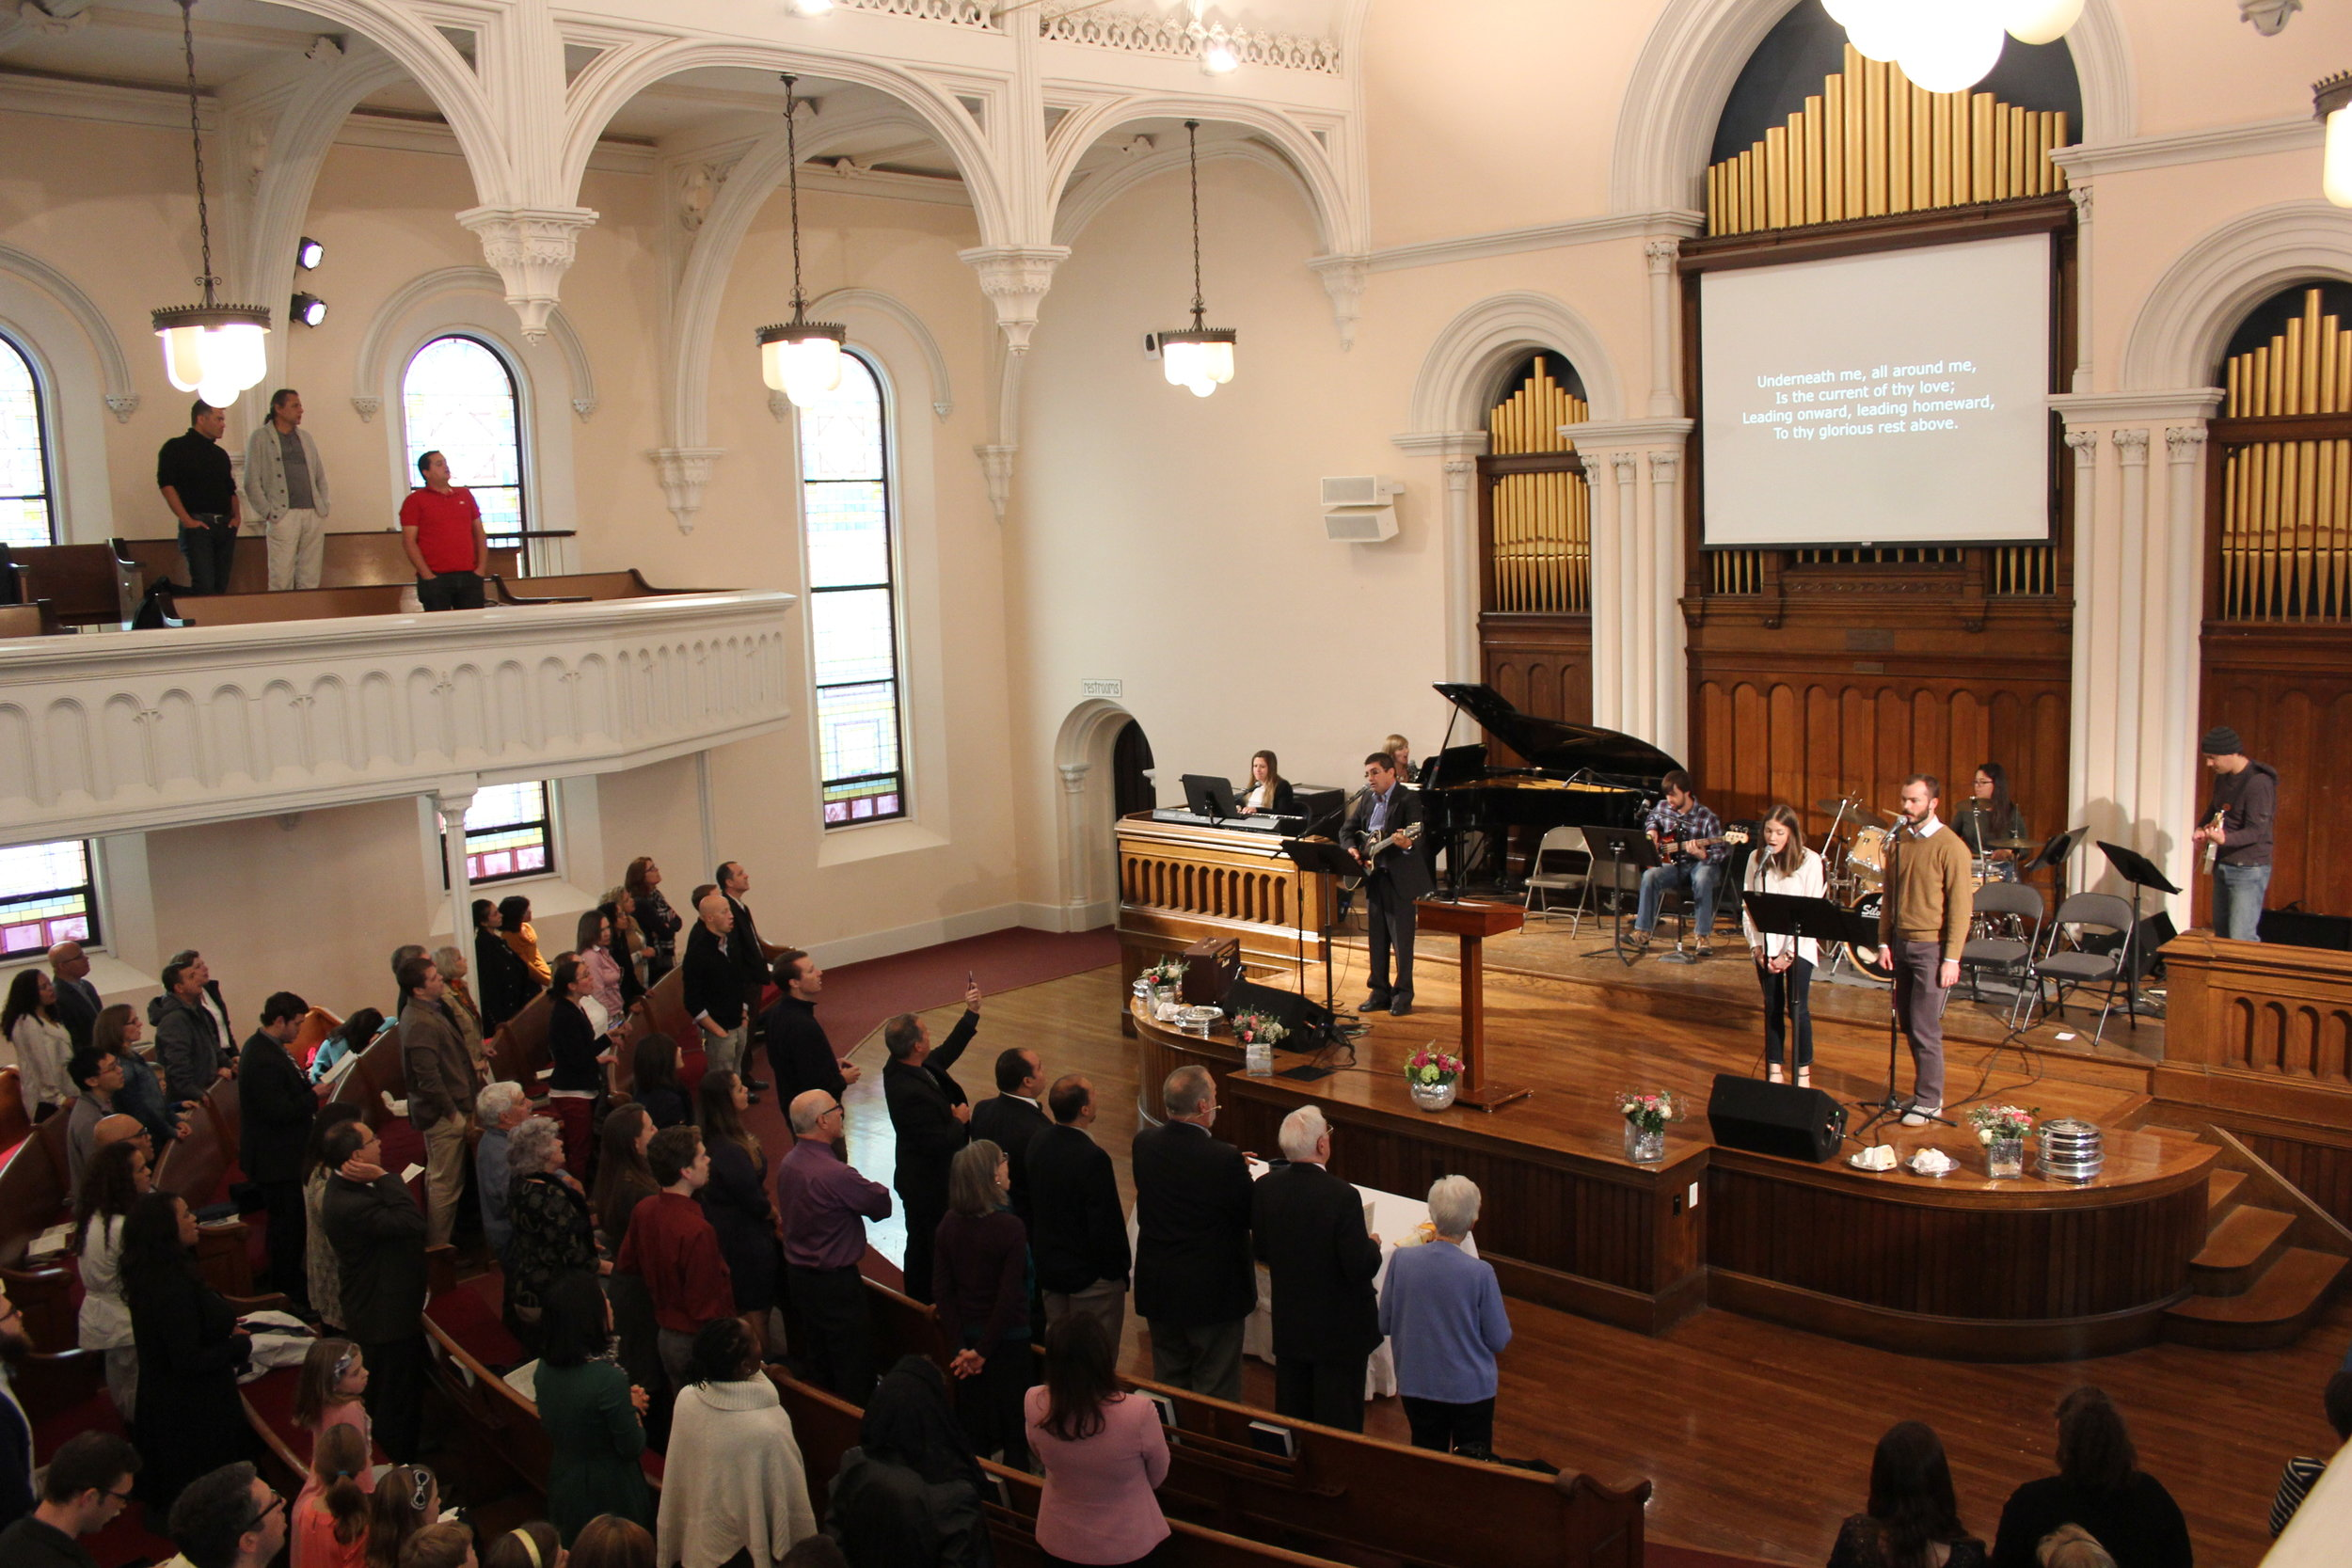 Christ the King Presbyterian Church - Cambridge  99 Prospect Street, Cambridge, 02139